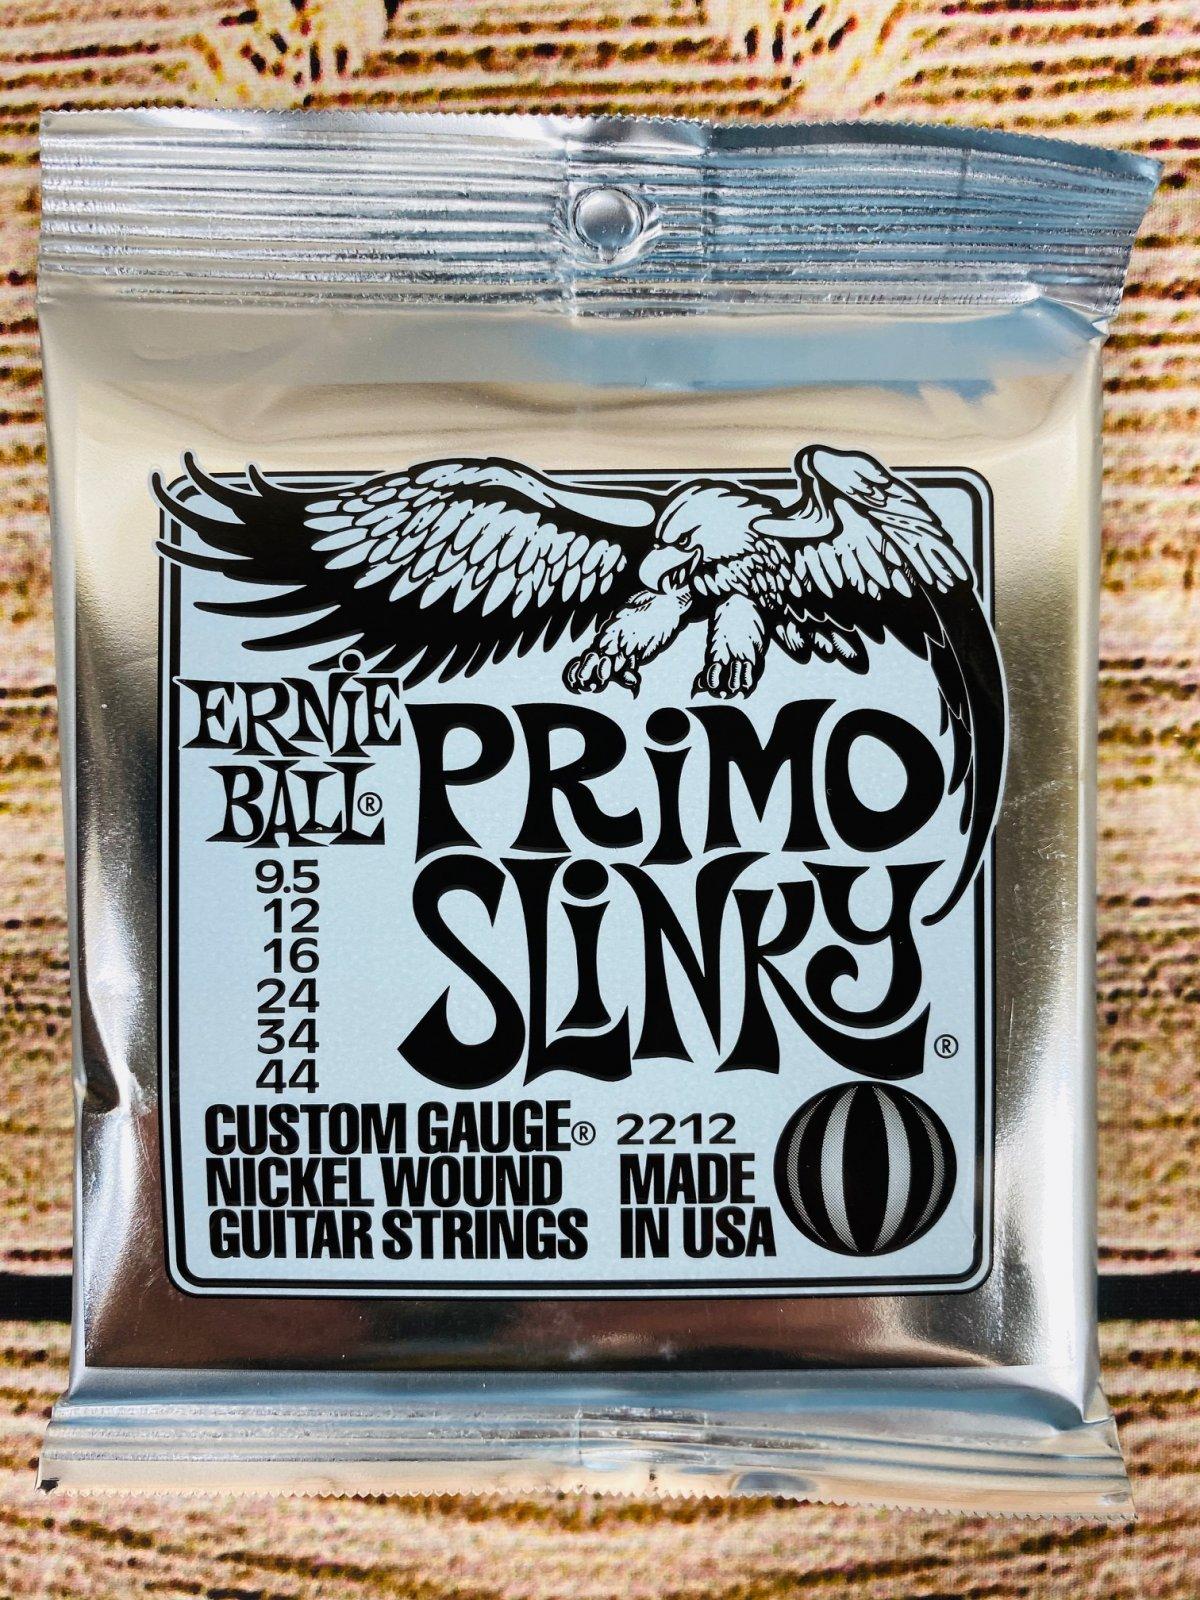 Ernie Ball 2212 Slinky Nickel Wound Electric Guitar Strings - .0095-.044 Primo Slinky